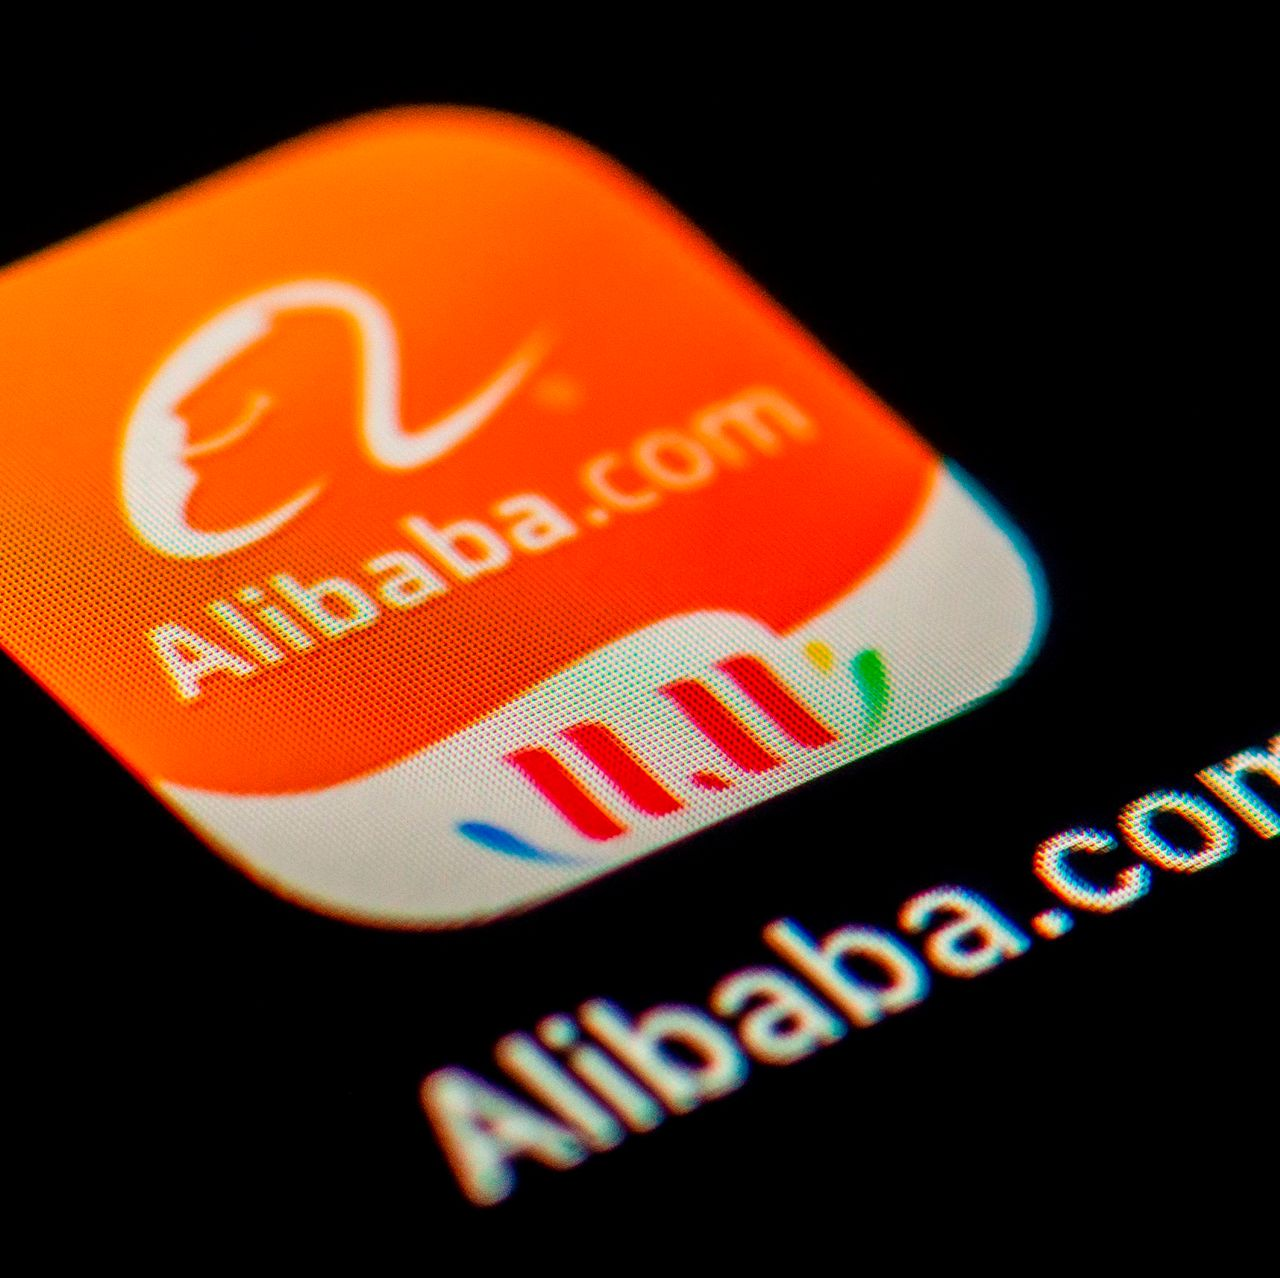 Alibaba Raises Stock Buyback Plan To 10 Billion But Shares Continue To Sink Marketwatch Alibaba group website, aliexpress, alimama, alipay, fliggy, alibaba cloud, alibaba international, alitelecom, dingtalk, juhuasuan, taobao marketplace, tmall, xiami, alios, 1688. alibaba raises stock buyback plan to